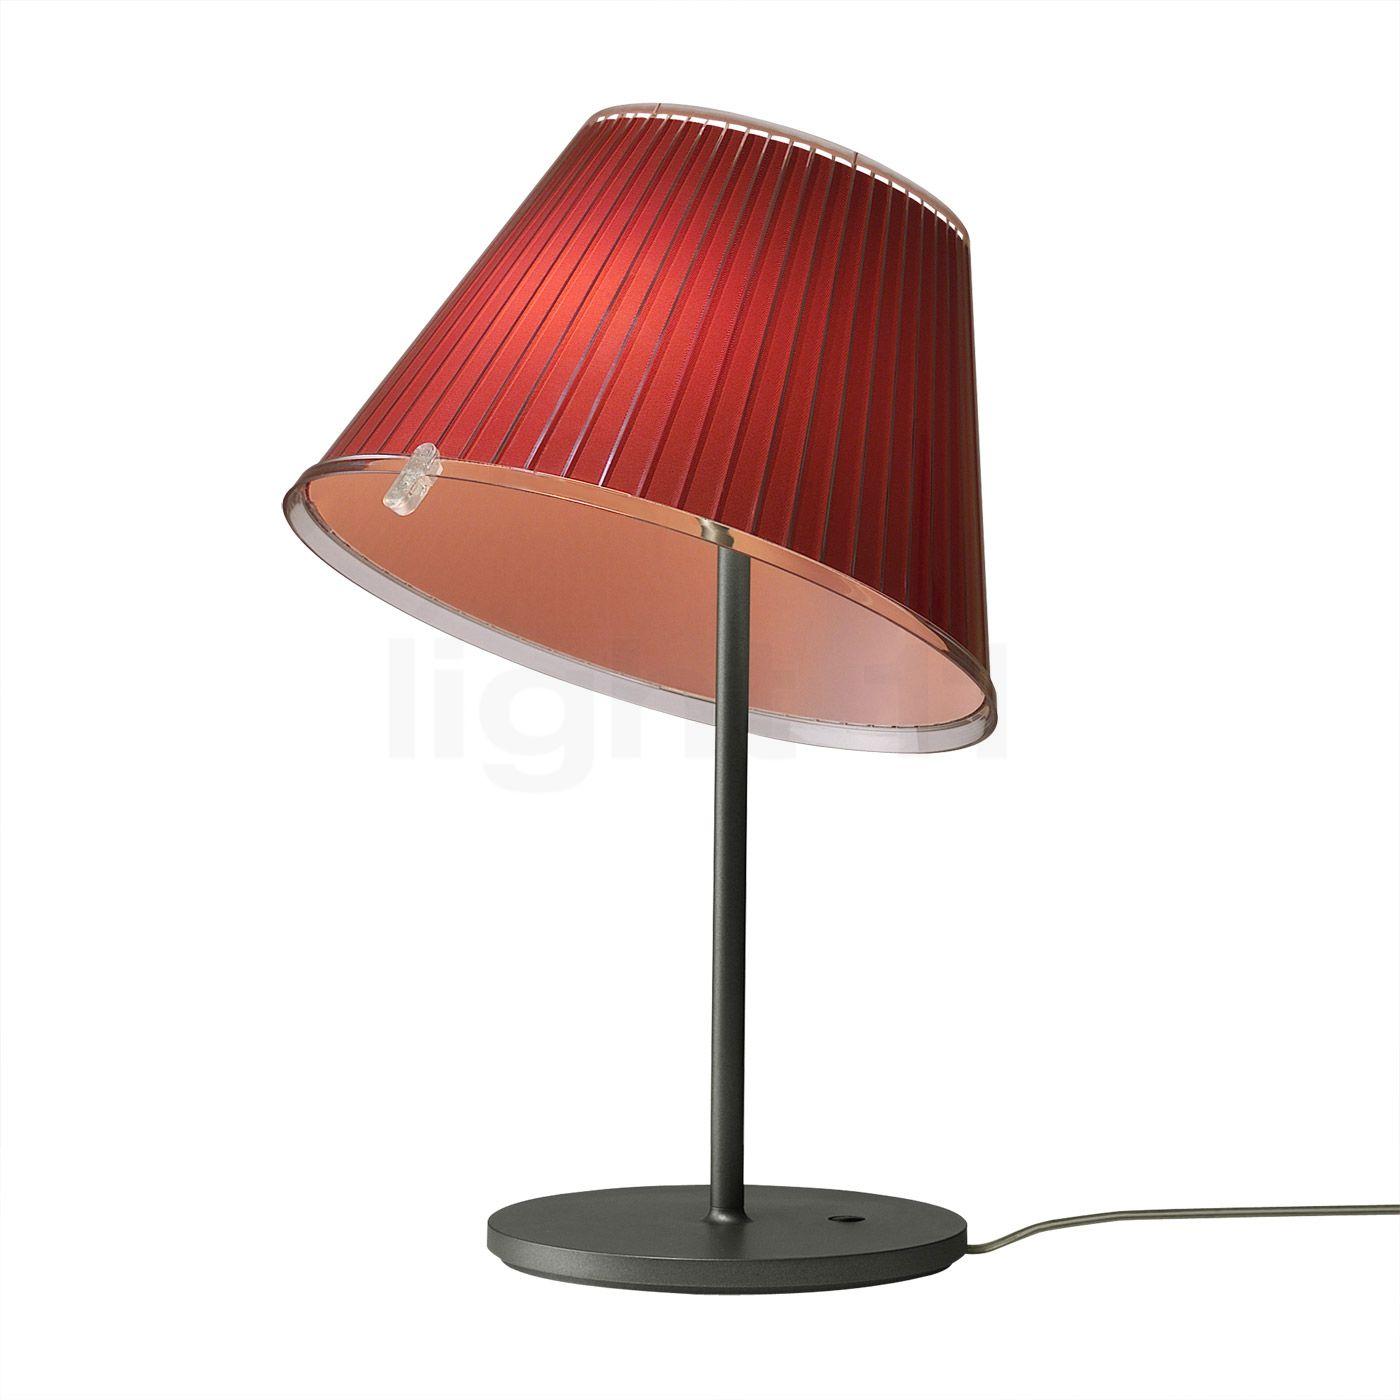 artemide choose tavolo lampe de chevet. Black Bedroom Furniture Sets. Home Design Ideas